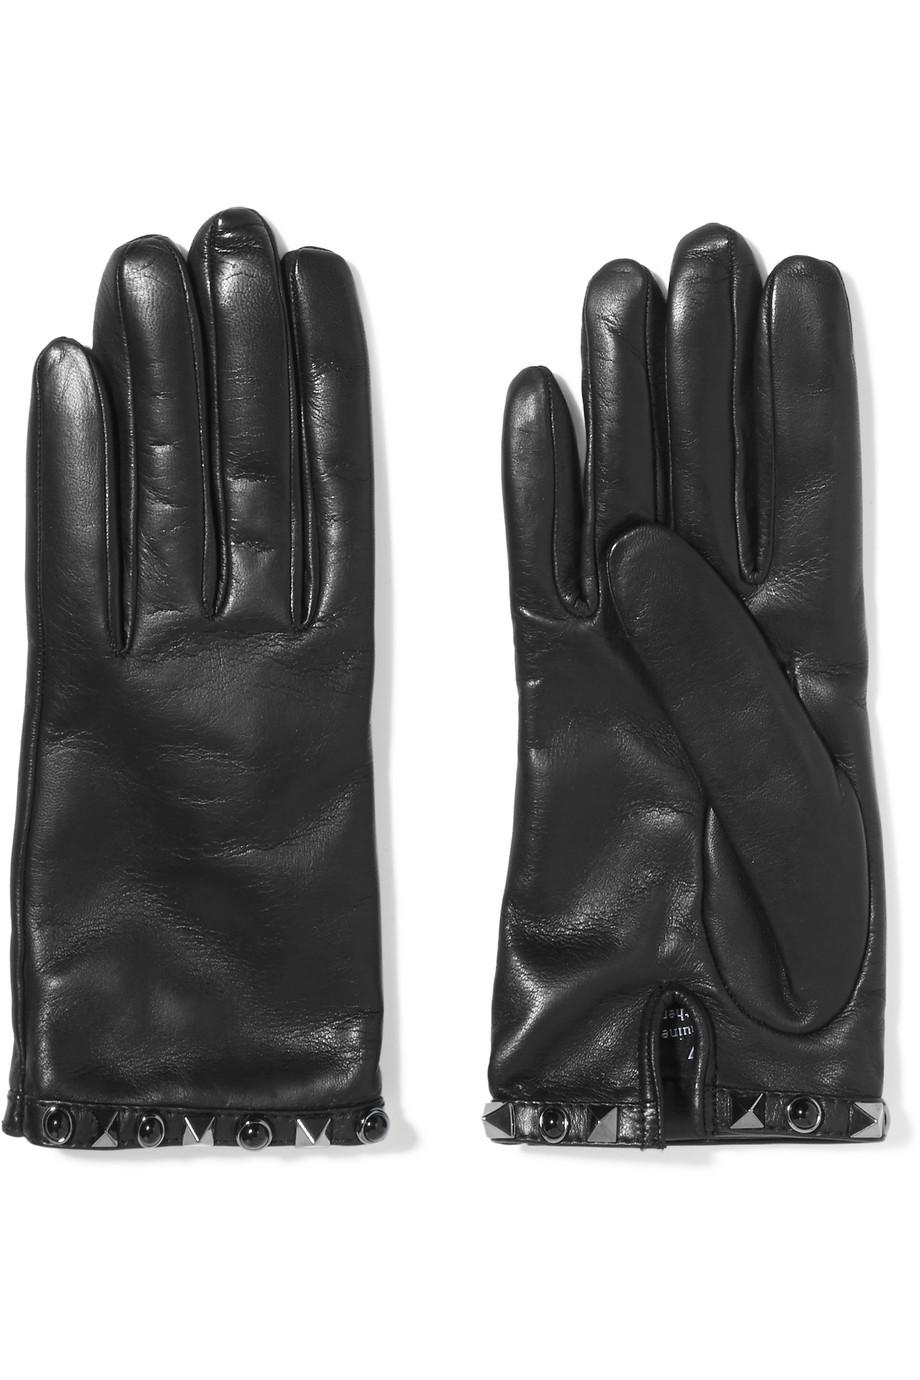 Valentino Embellished Leather Gloves, Black, Women's, Size: 7